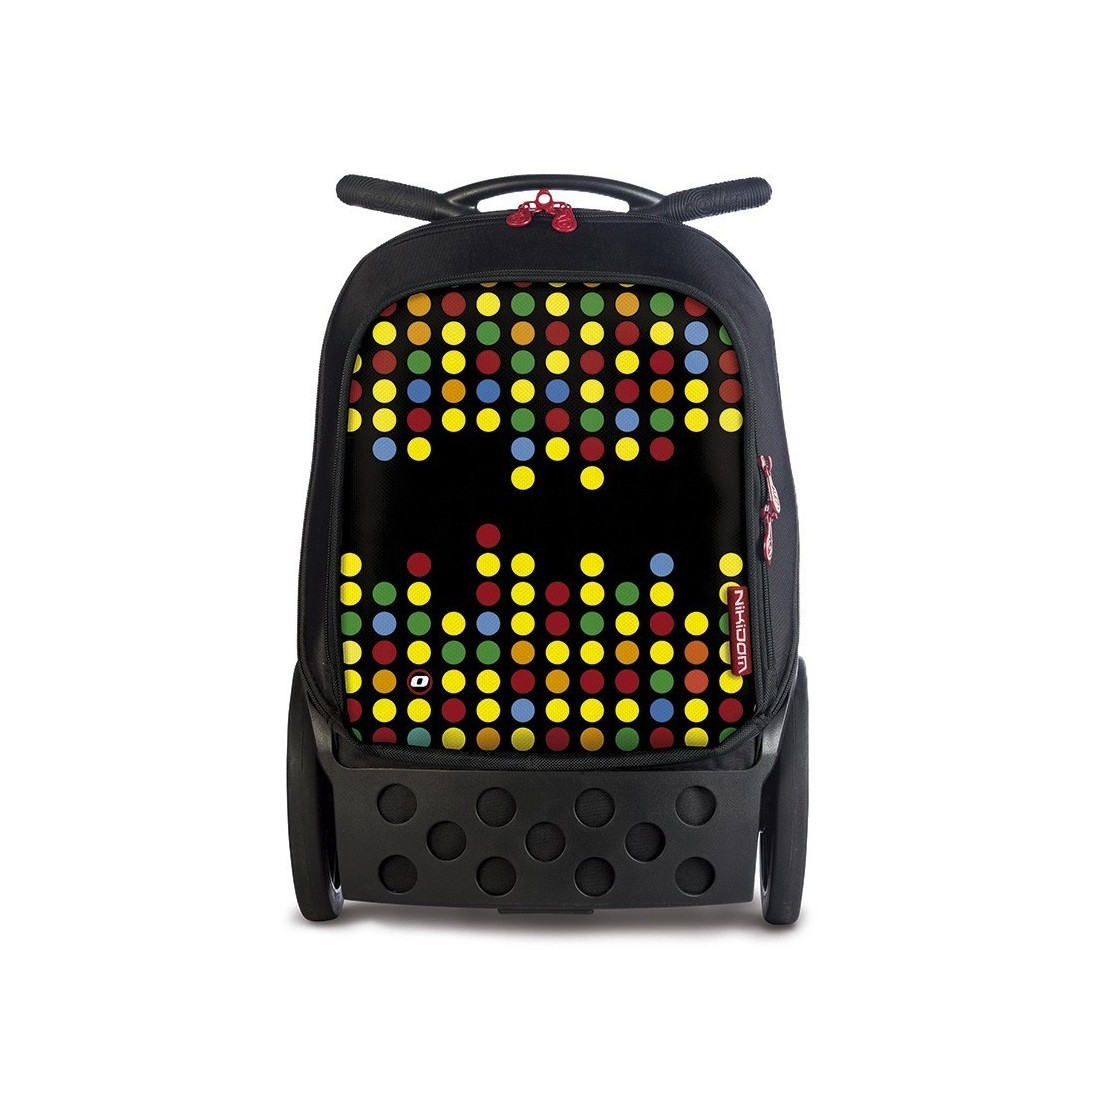 Plecak szkolny na kółkach bez szelek Roller Technodots dla dziewczyny. - plecak-tornister.pl